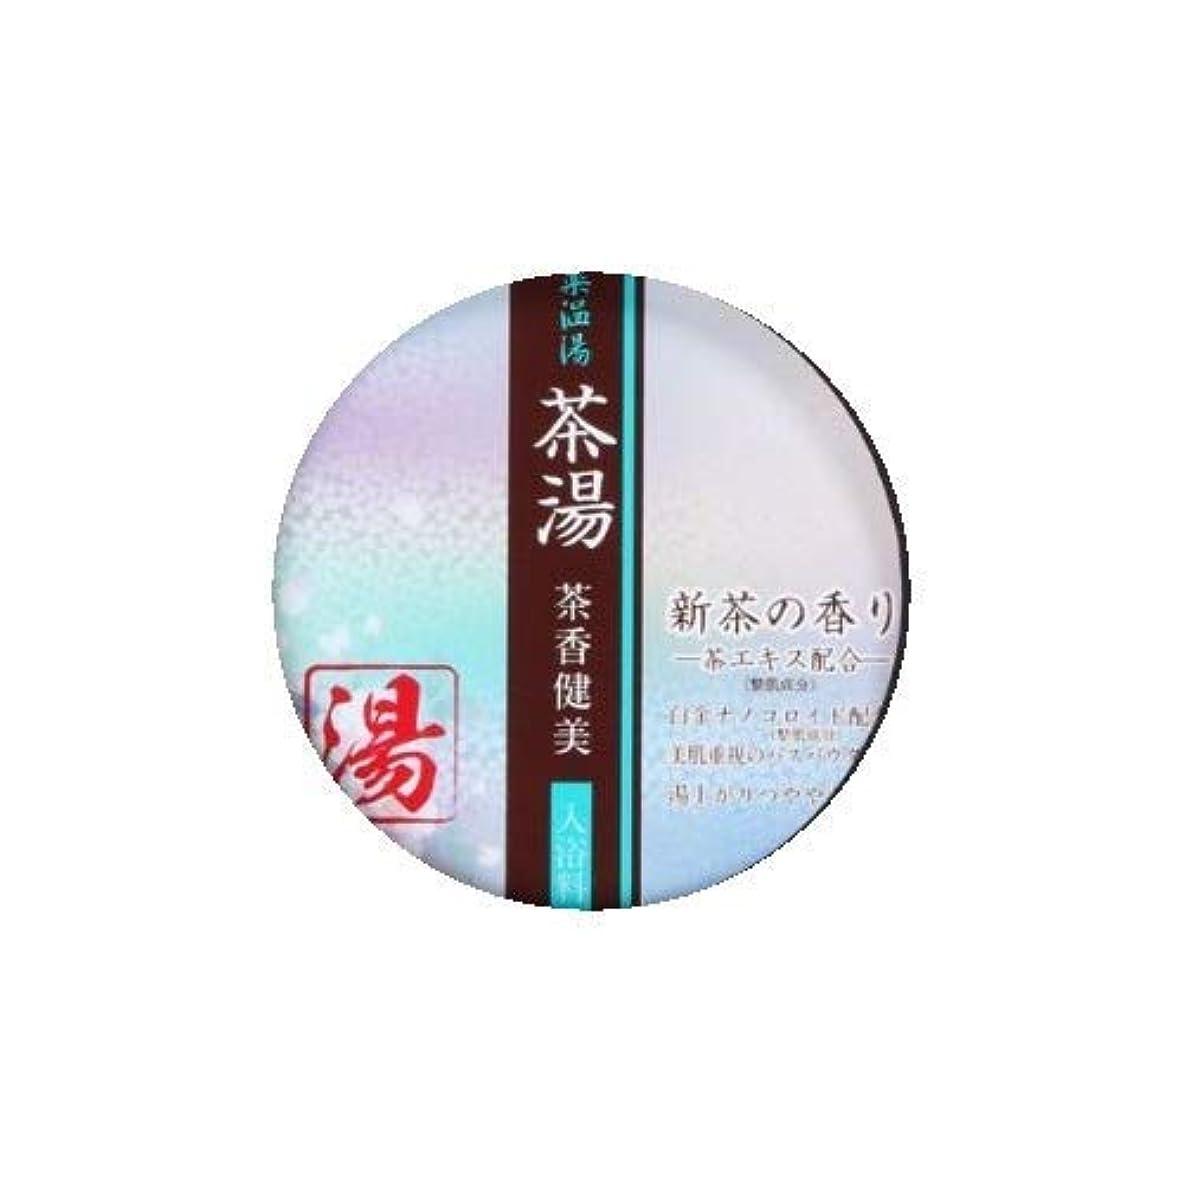 原始的な預言者一回薬温湯 茶湯 入浴料 新茶の香り POF-10S